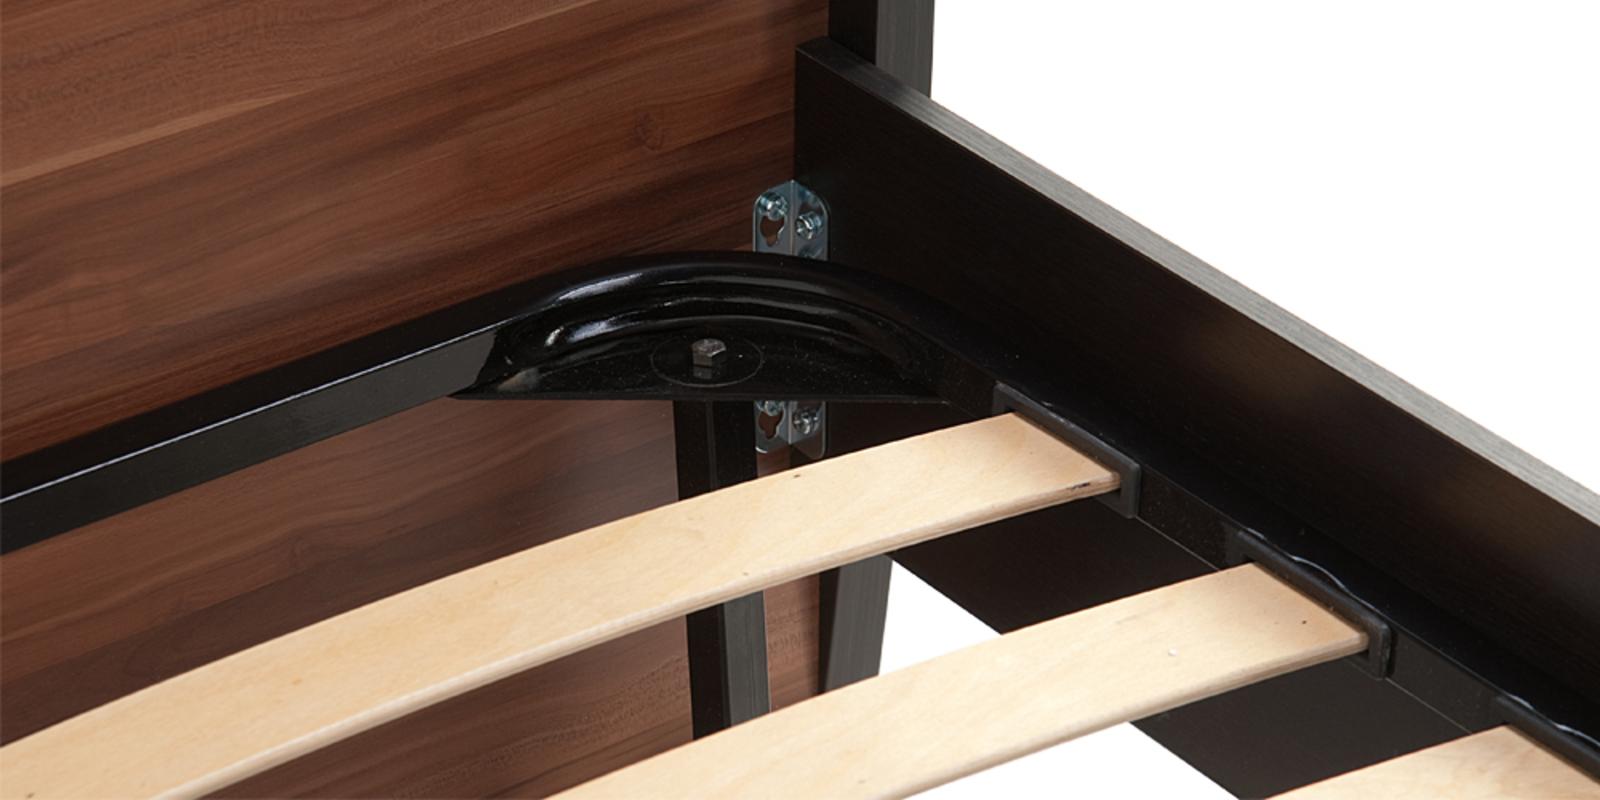 Кровать каркасная 200х160 Корсика без подъемного механизма (Слива валлис)